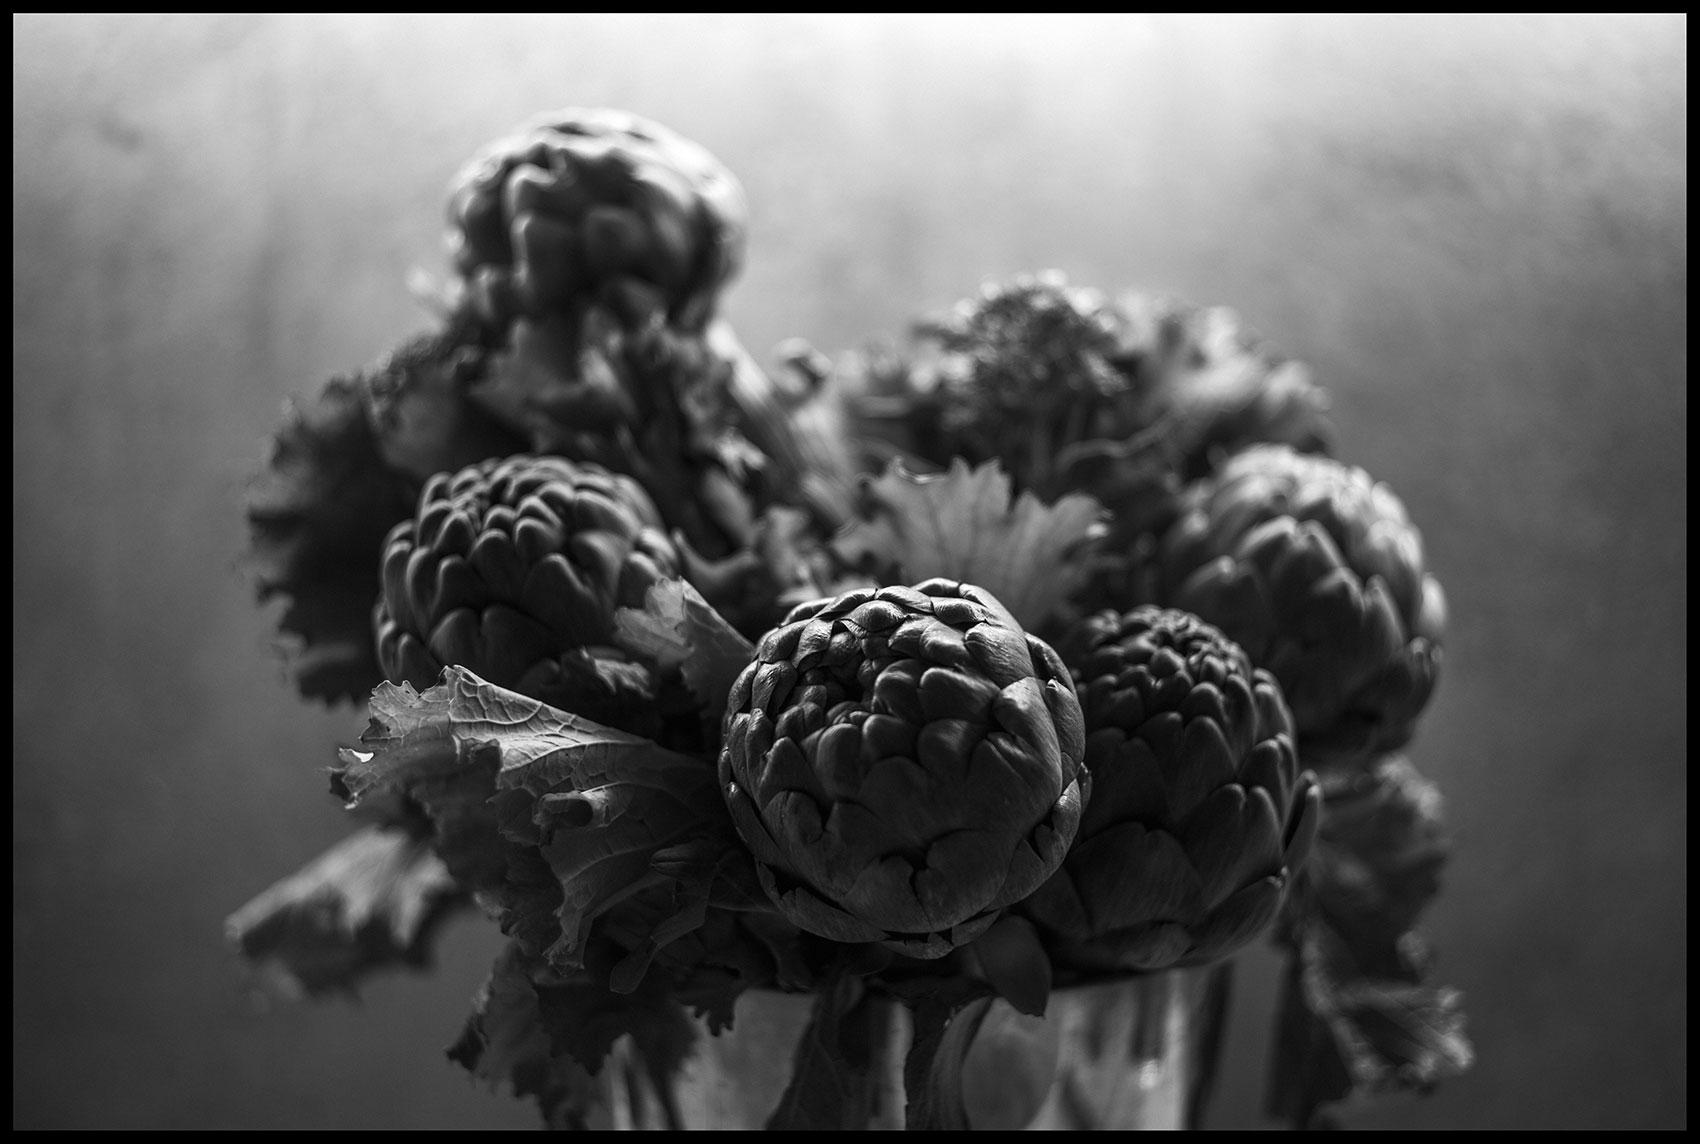 Natura Morta | Album QUARANTINE | Stefano Paradiso - Photographer